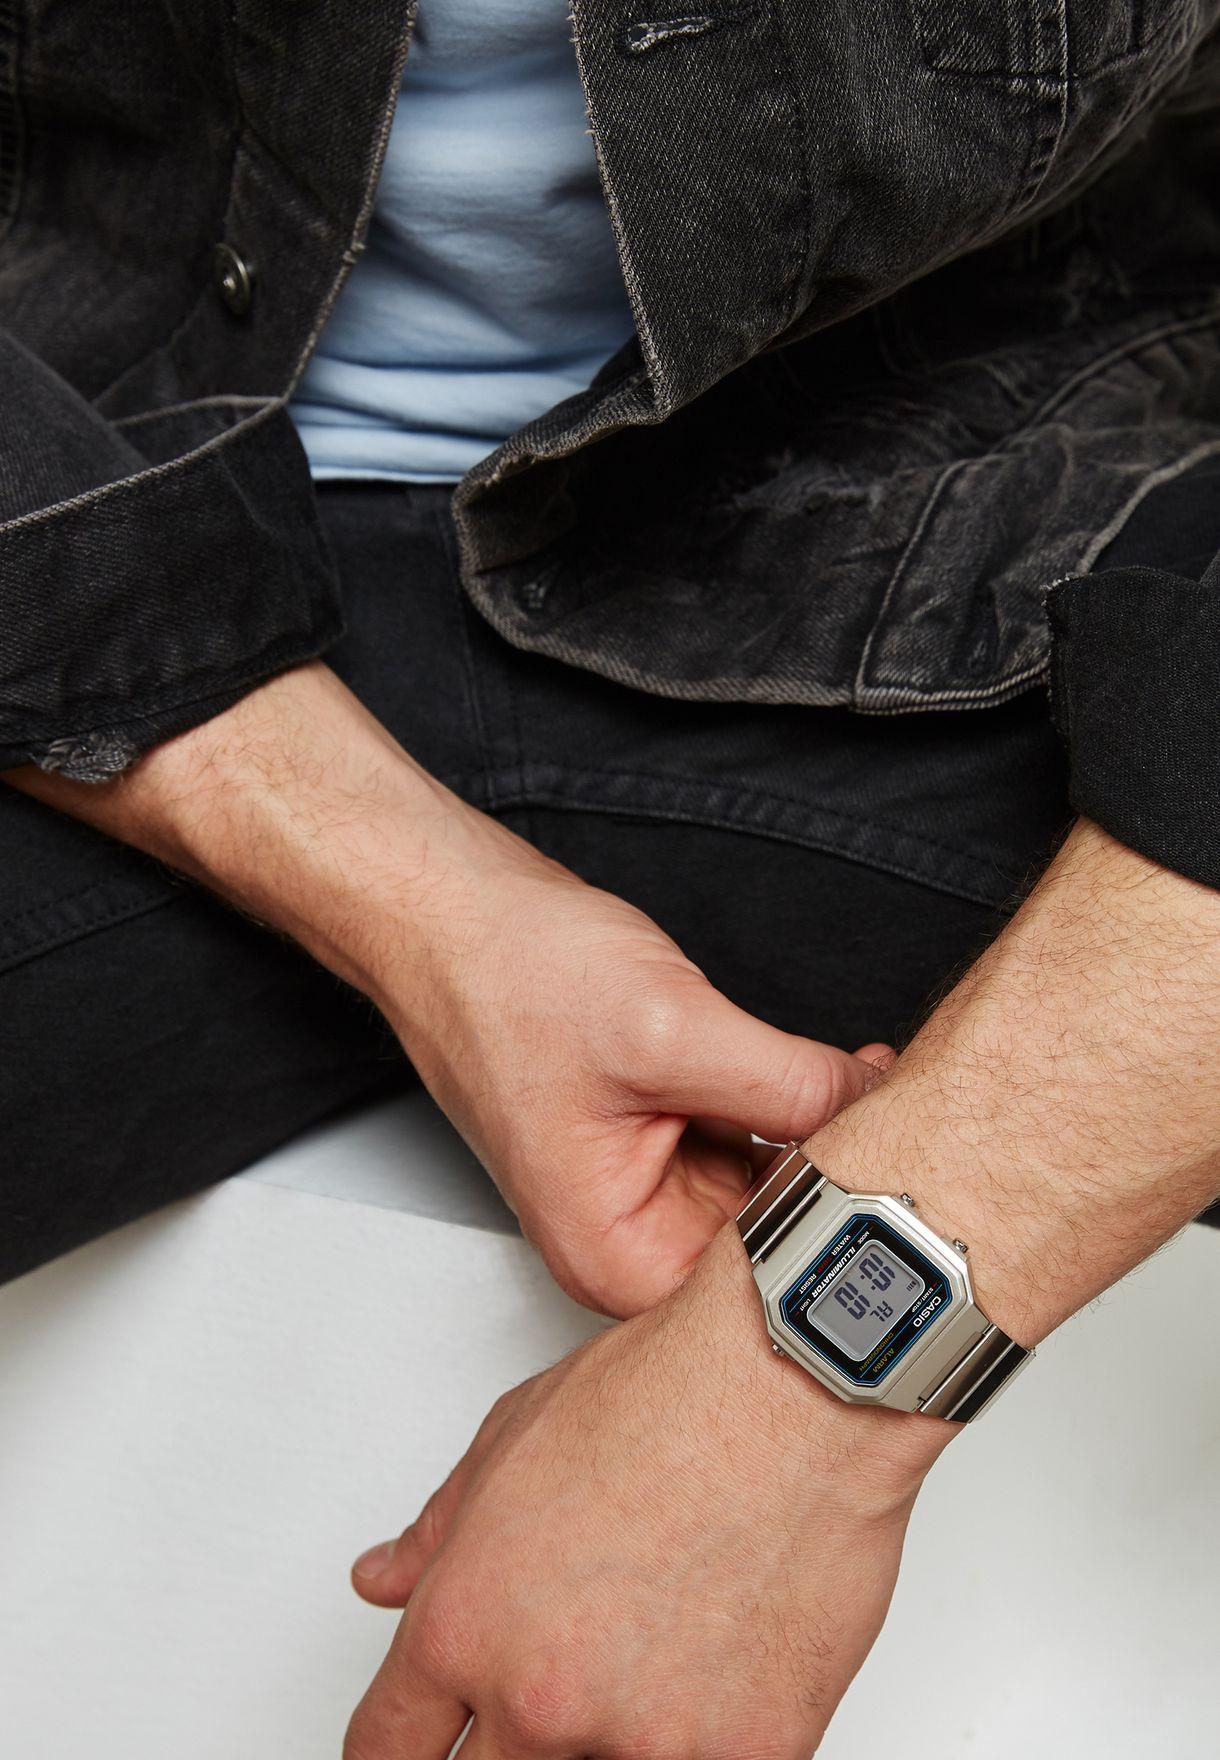 Classic Retro Digital Watch